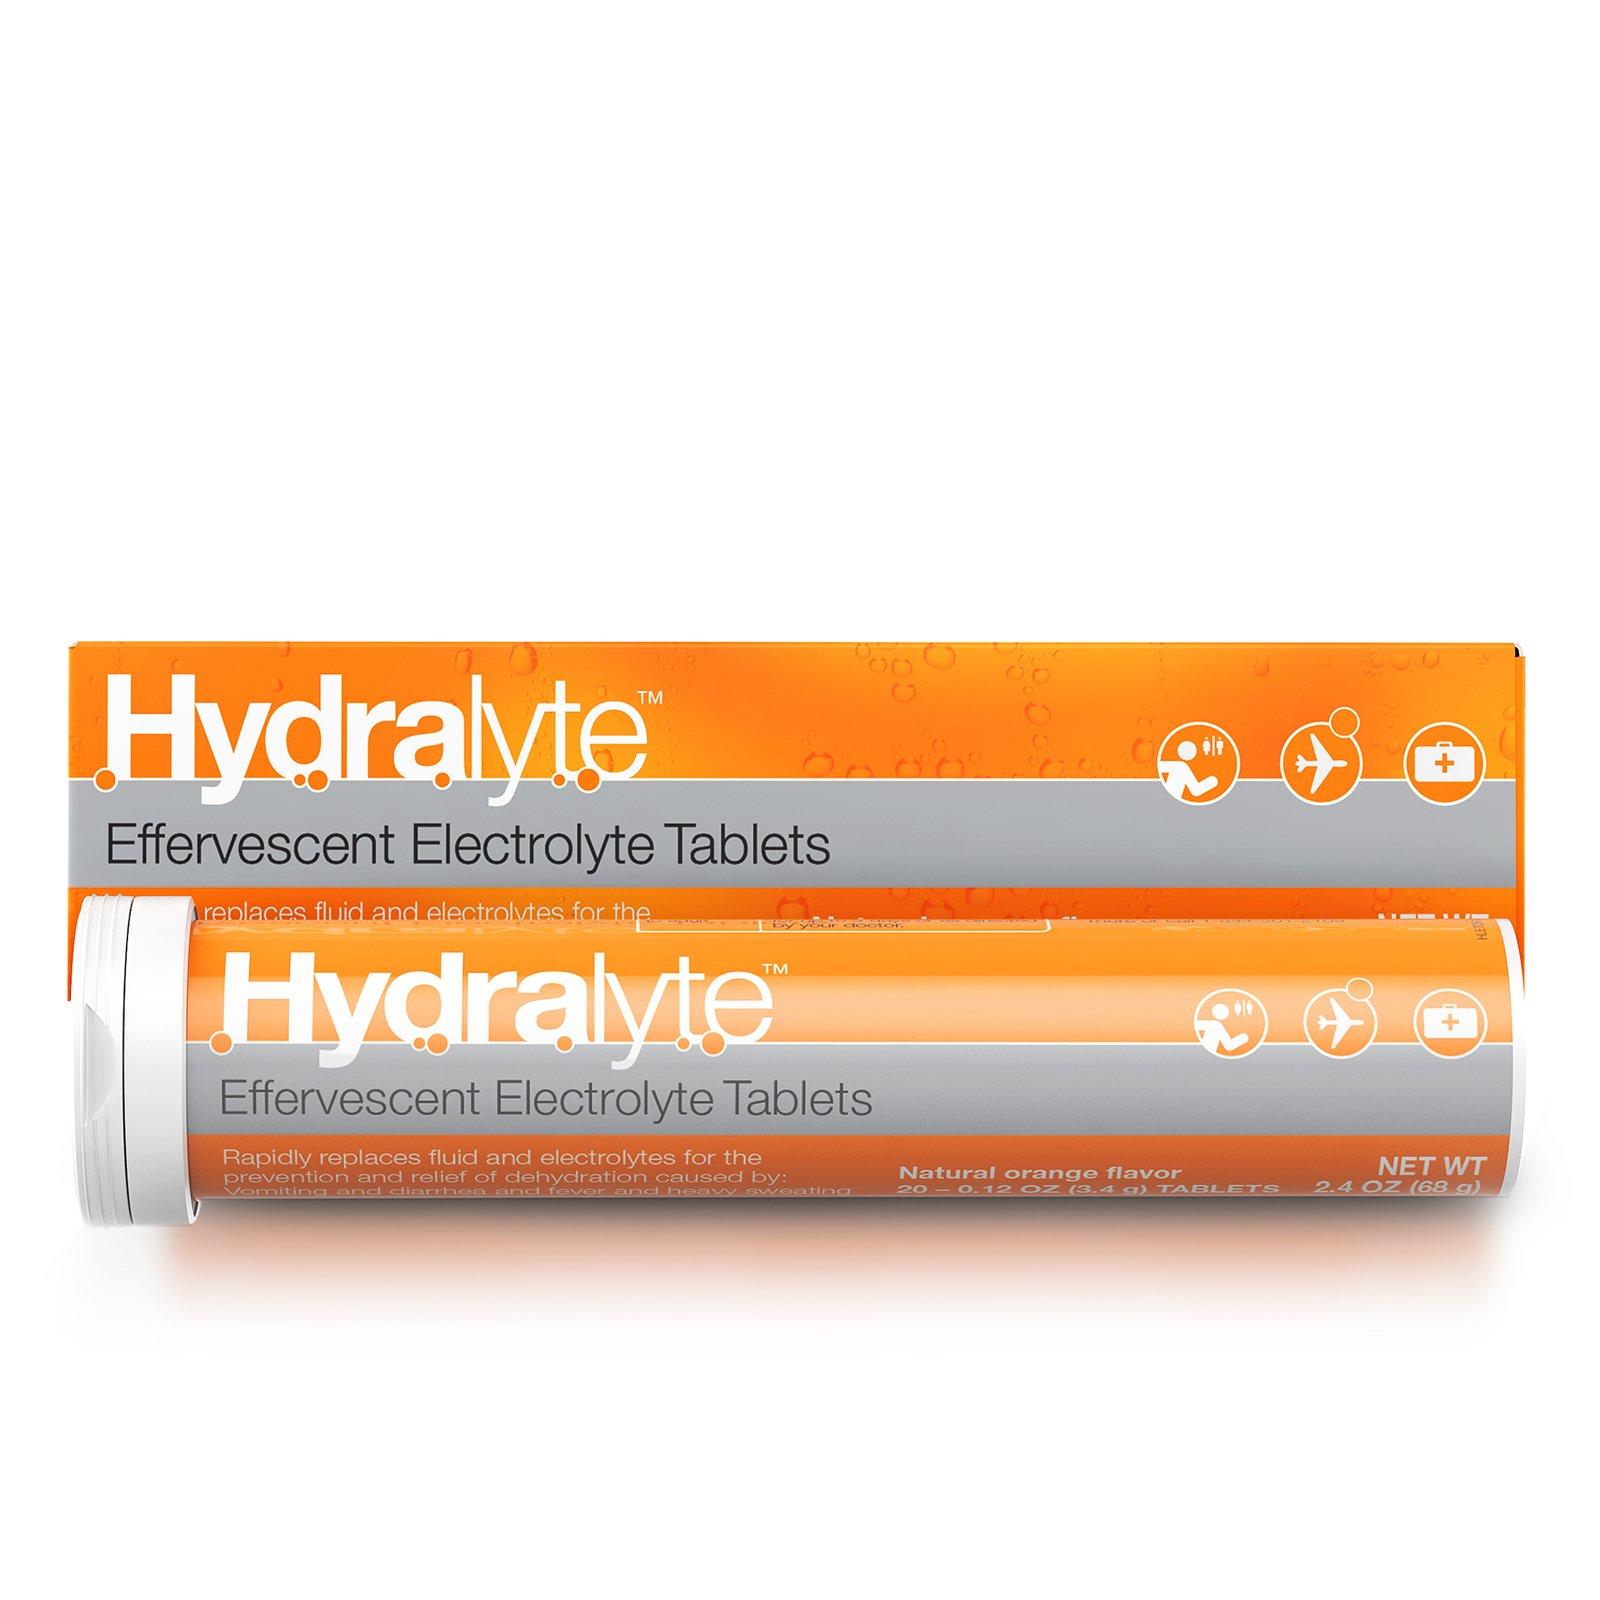 Hydralyte Effervescent Electrolyte go Rehydration